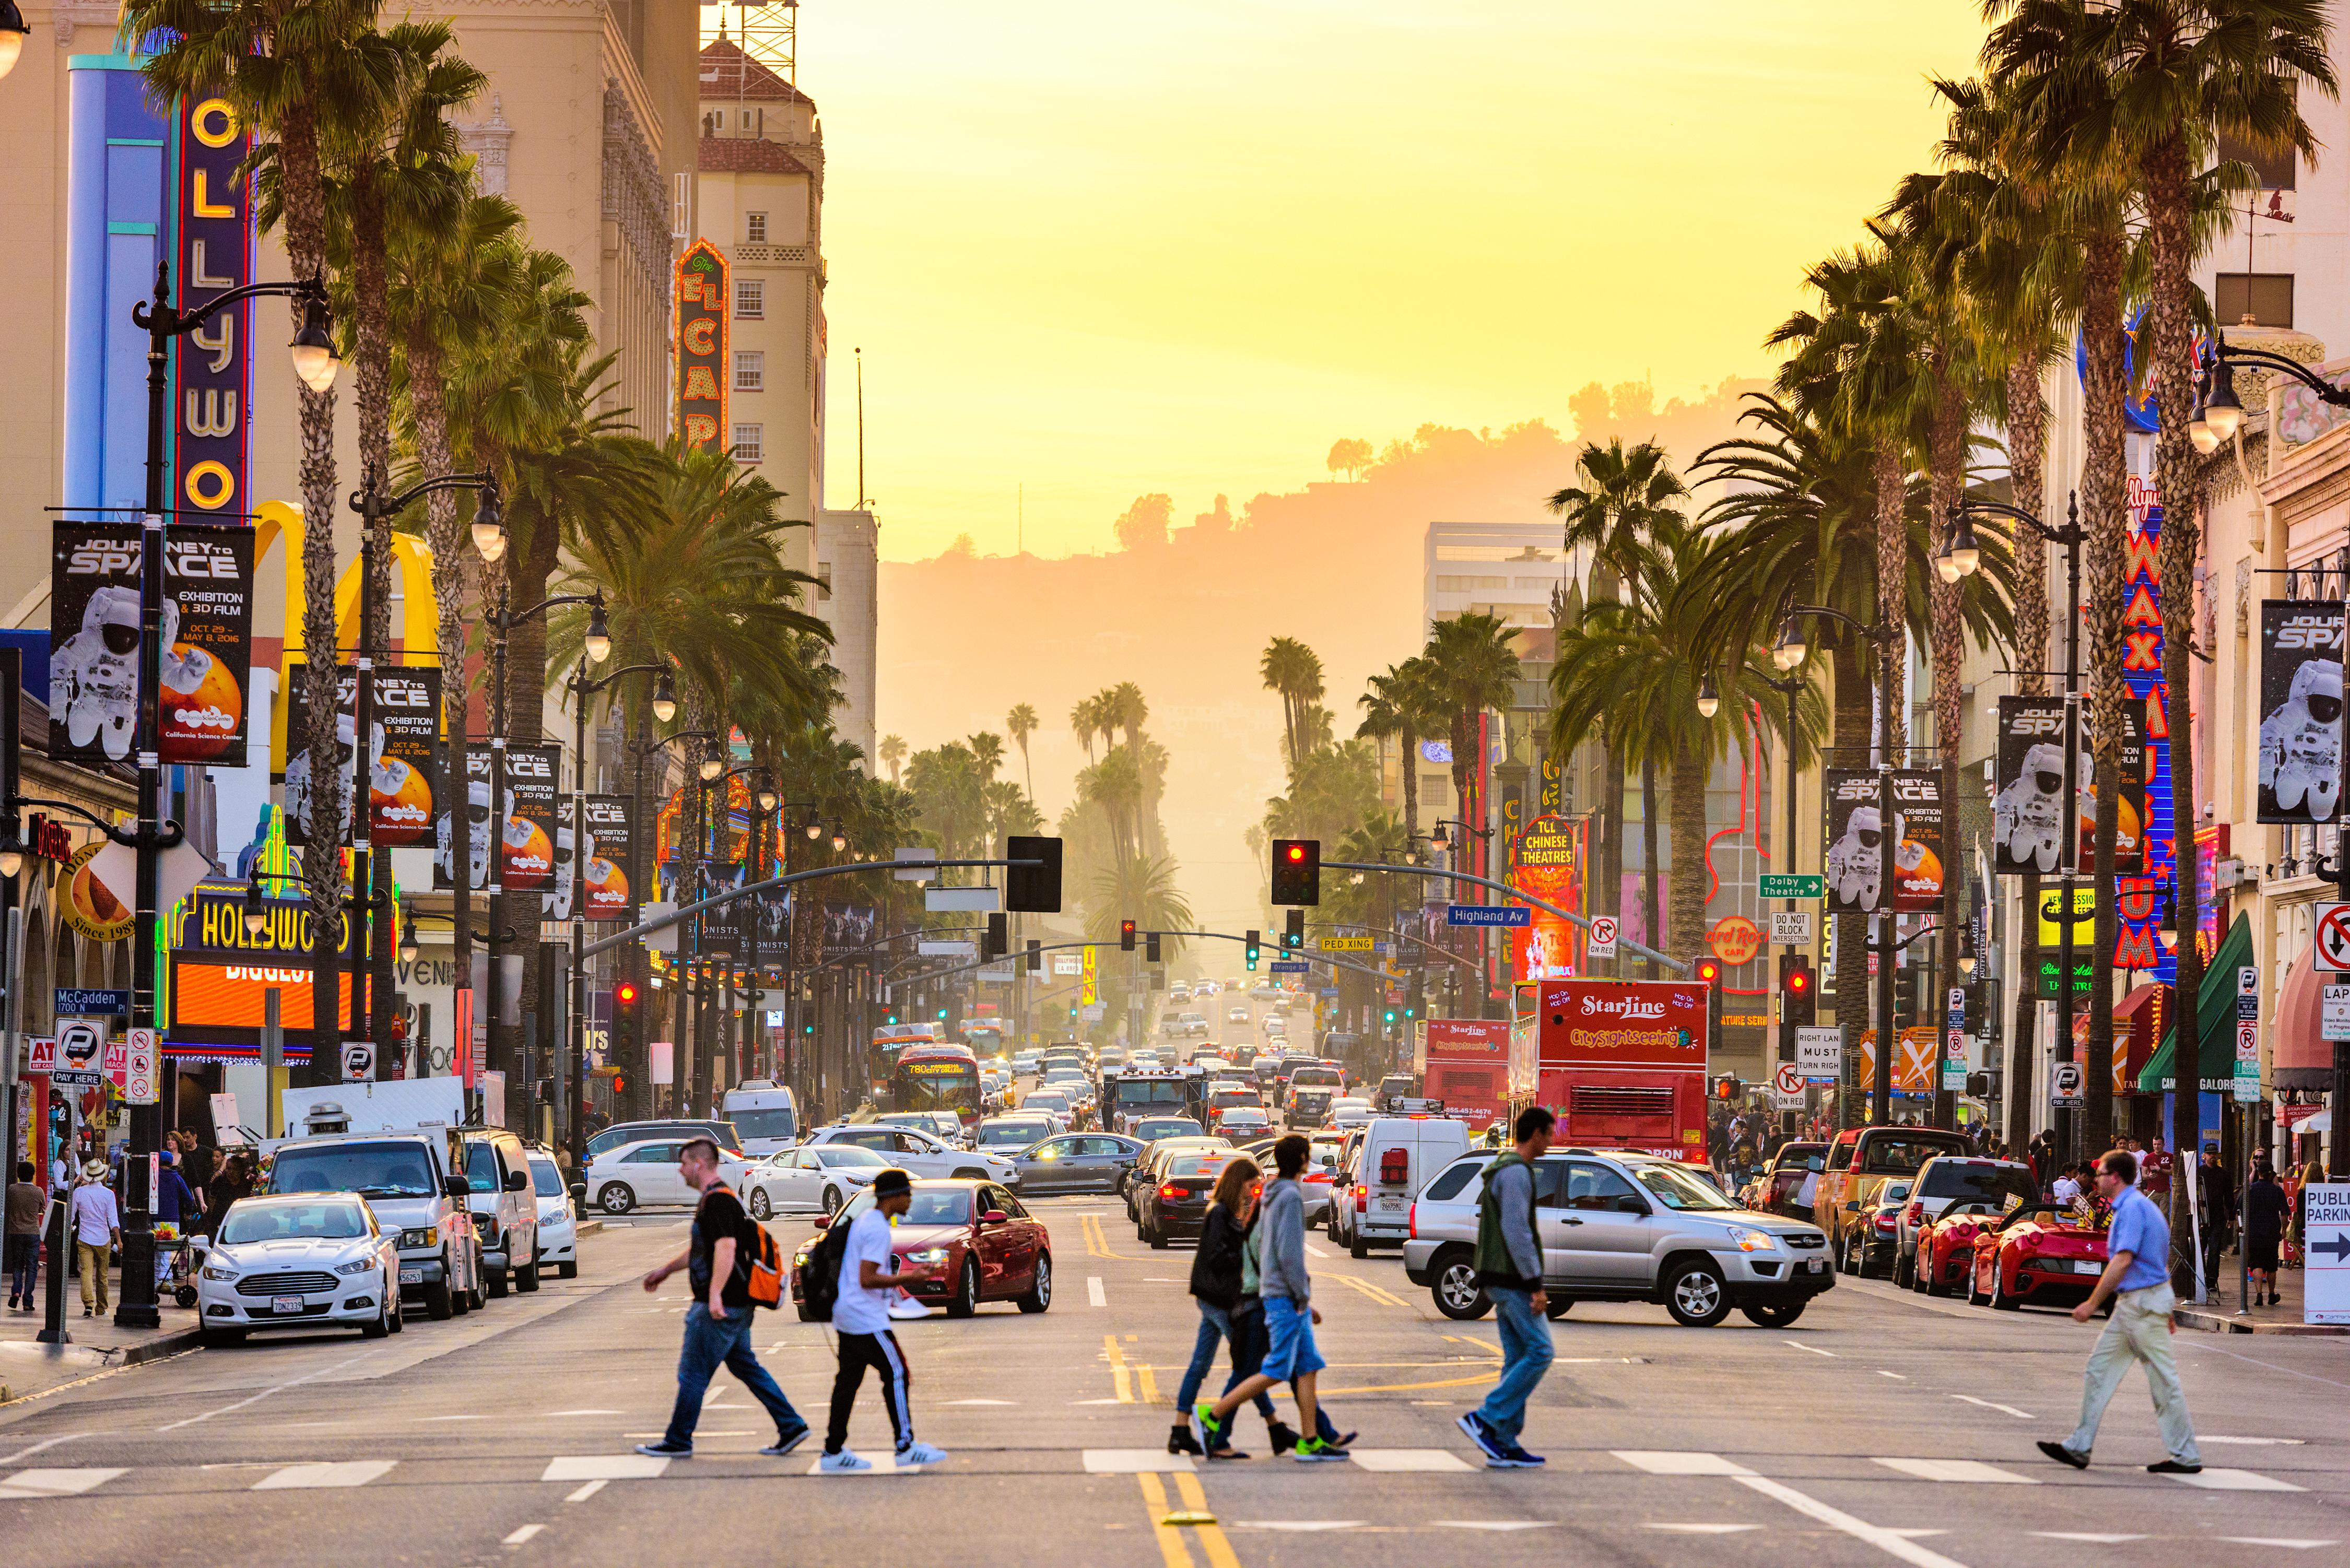 Pedestrians crossing a busy street in Los Angeles.